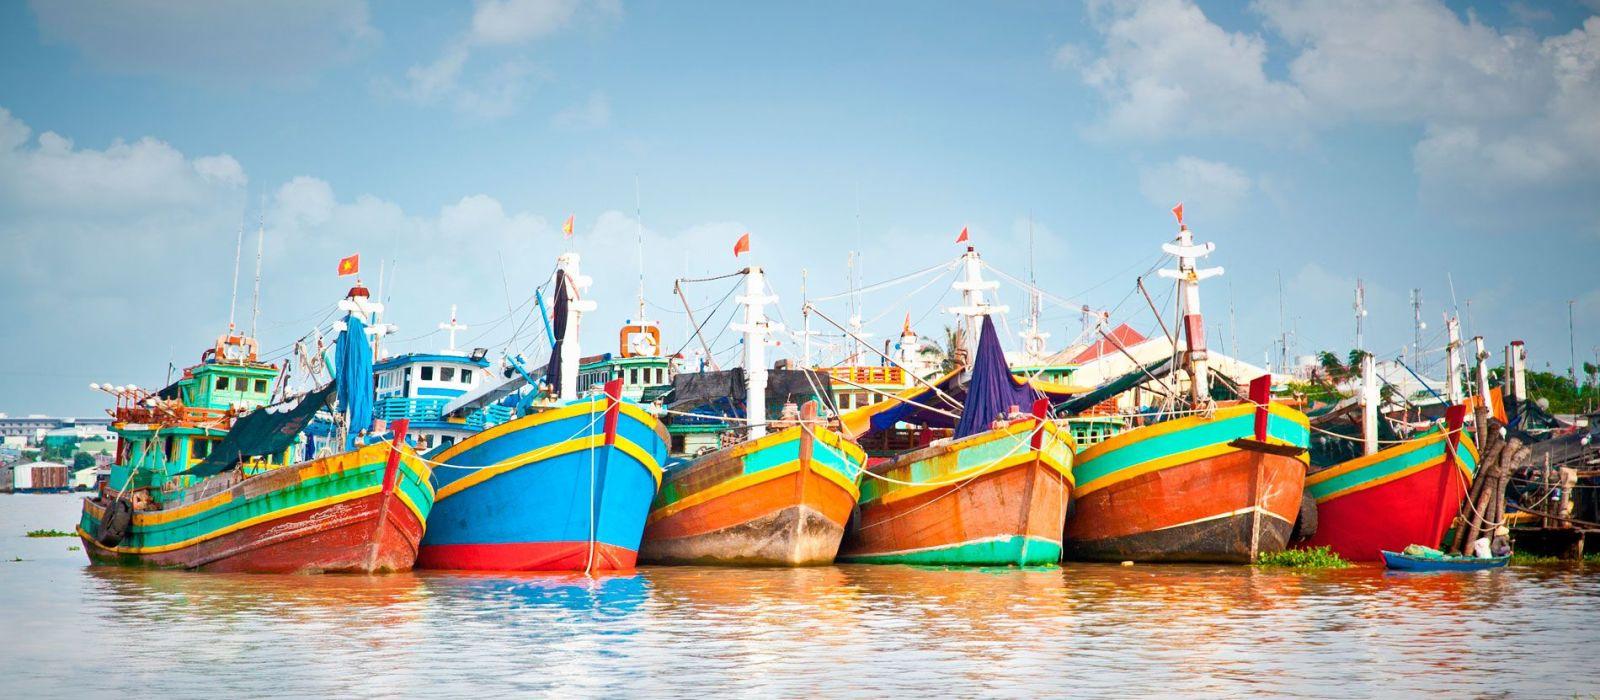 Reiseziel My Tho / Mekong Delta Vietnam